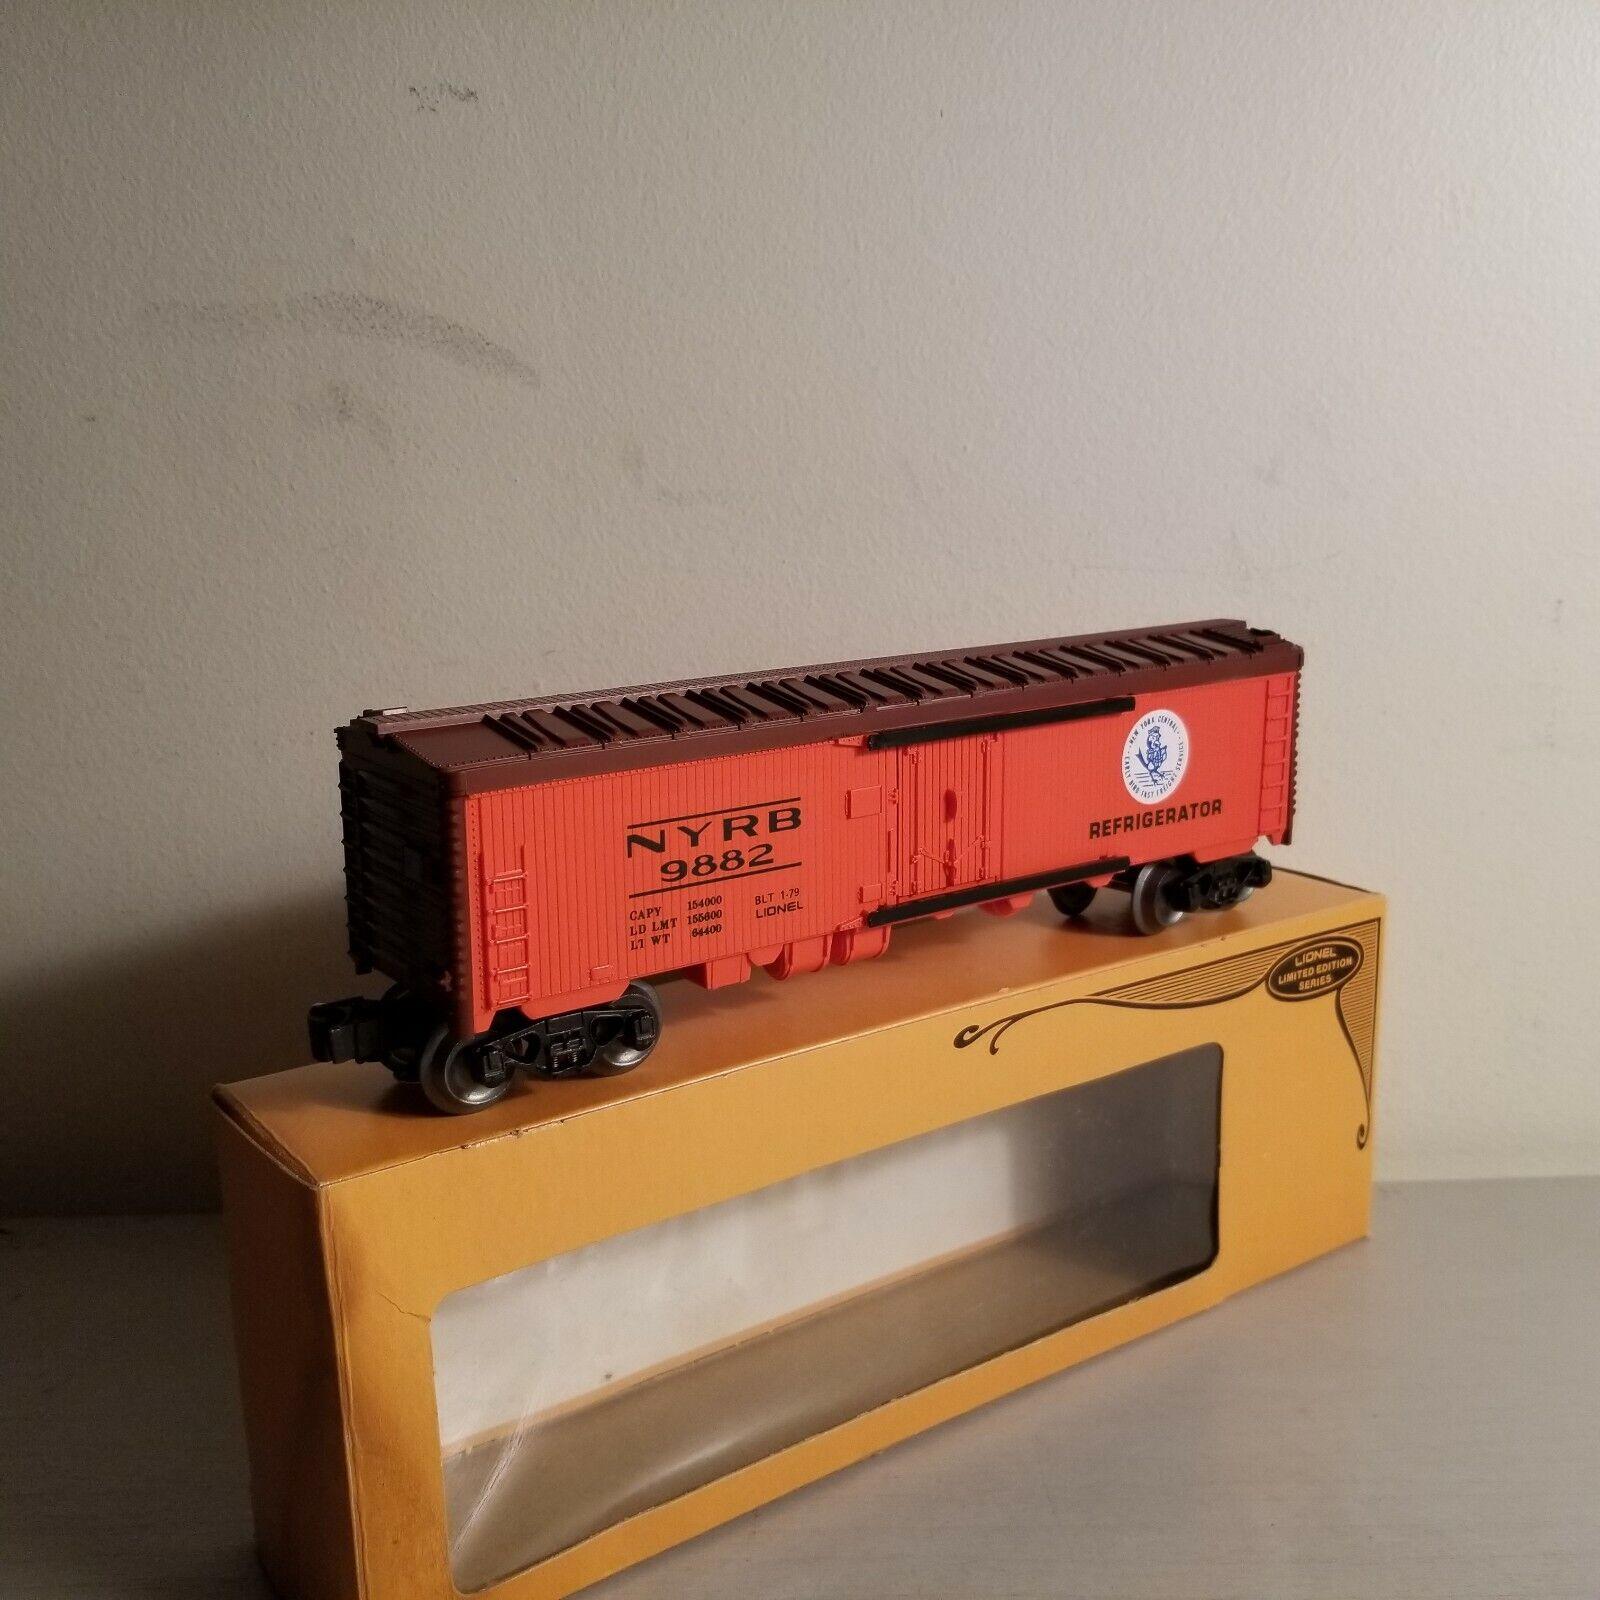 LIONEL 6-9882 New York Central Reefer BRAND NEW Original Box  - $9.50